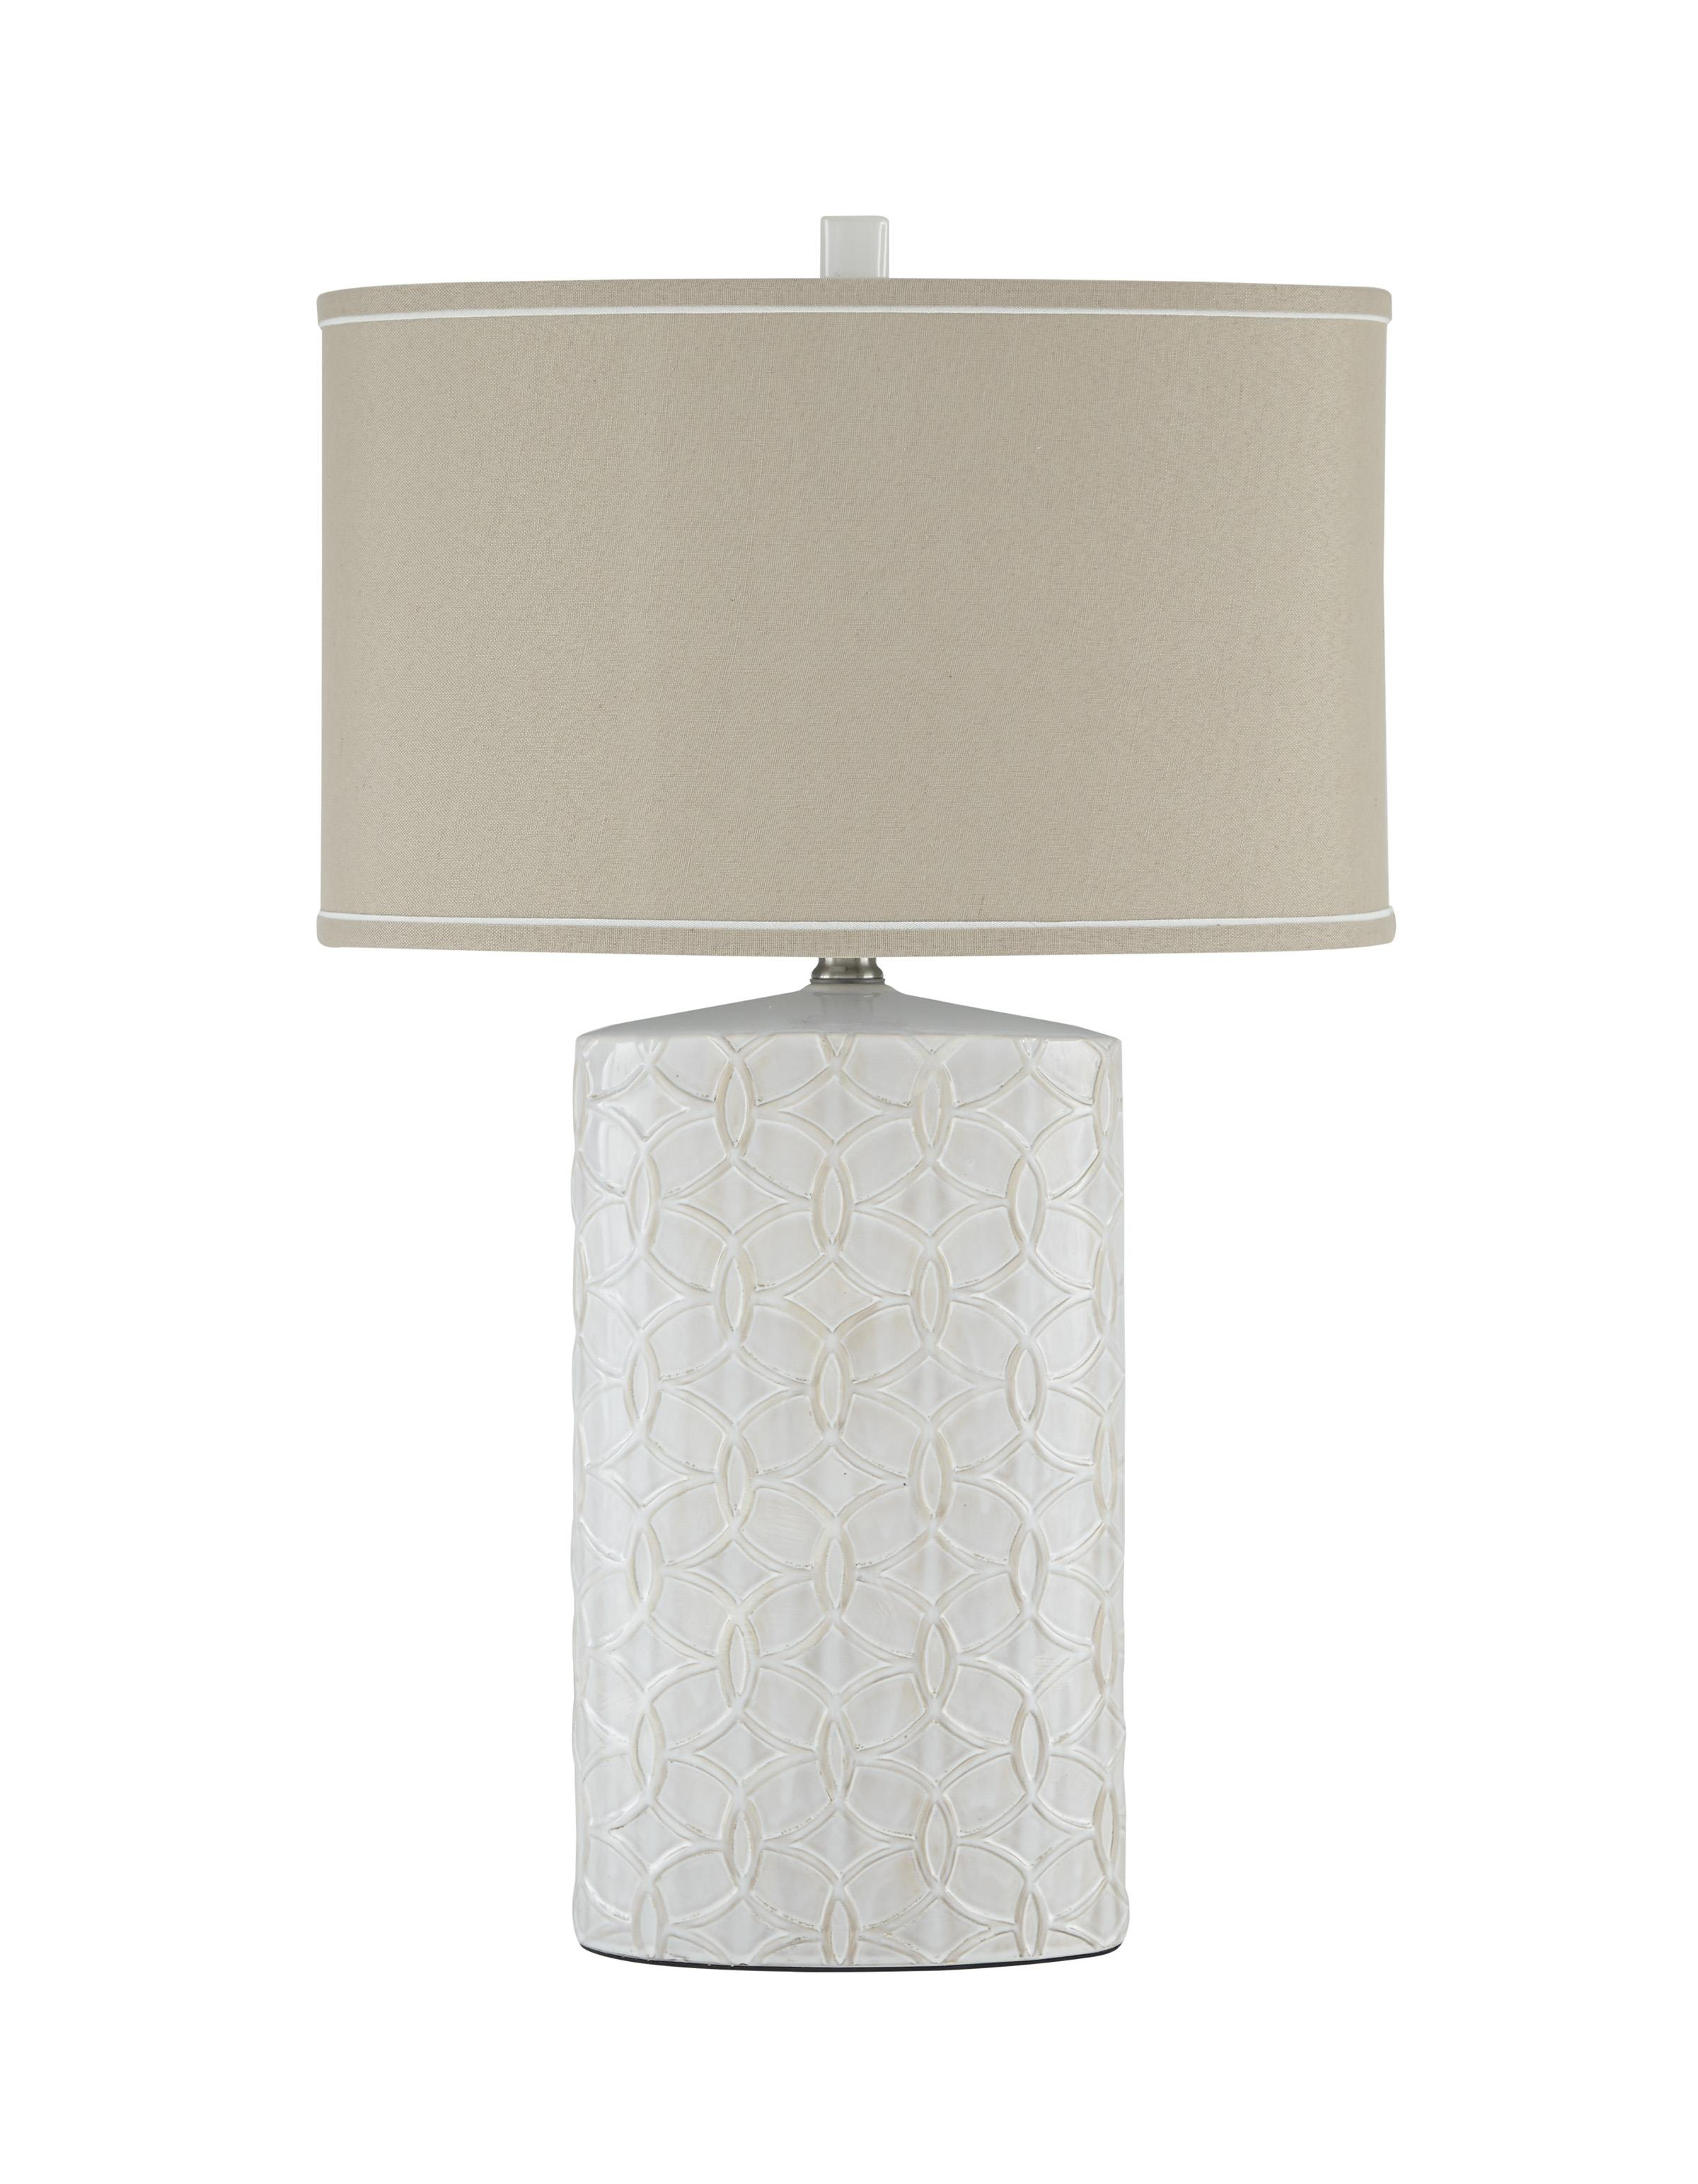 signature design by ashley lamps vintage style l100374 shelvia antique white ceramic table. Black Bedroom Furniture Sets. Home Design Ideas